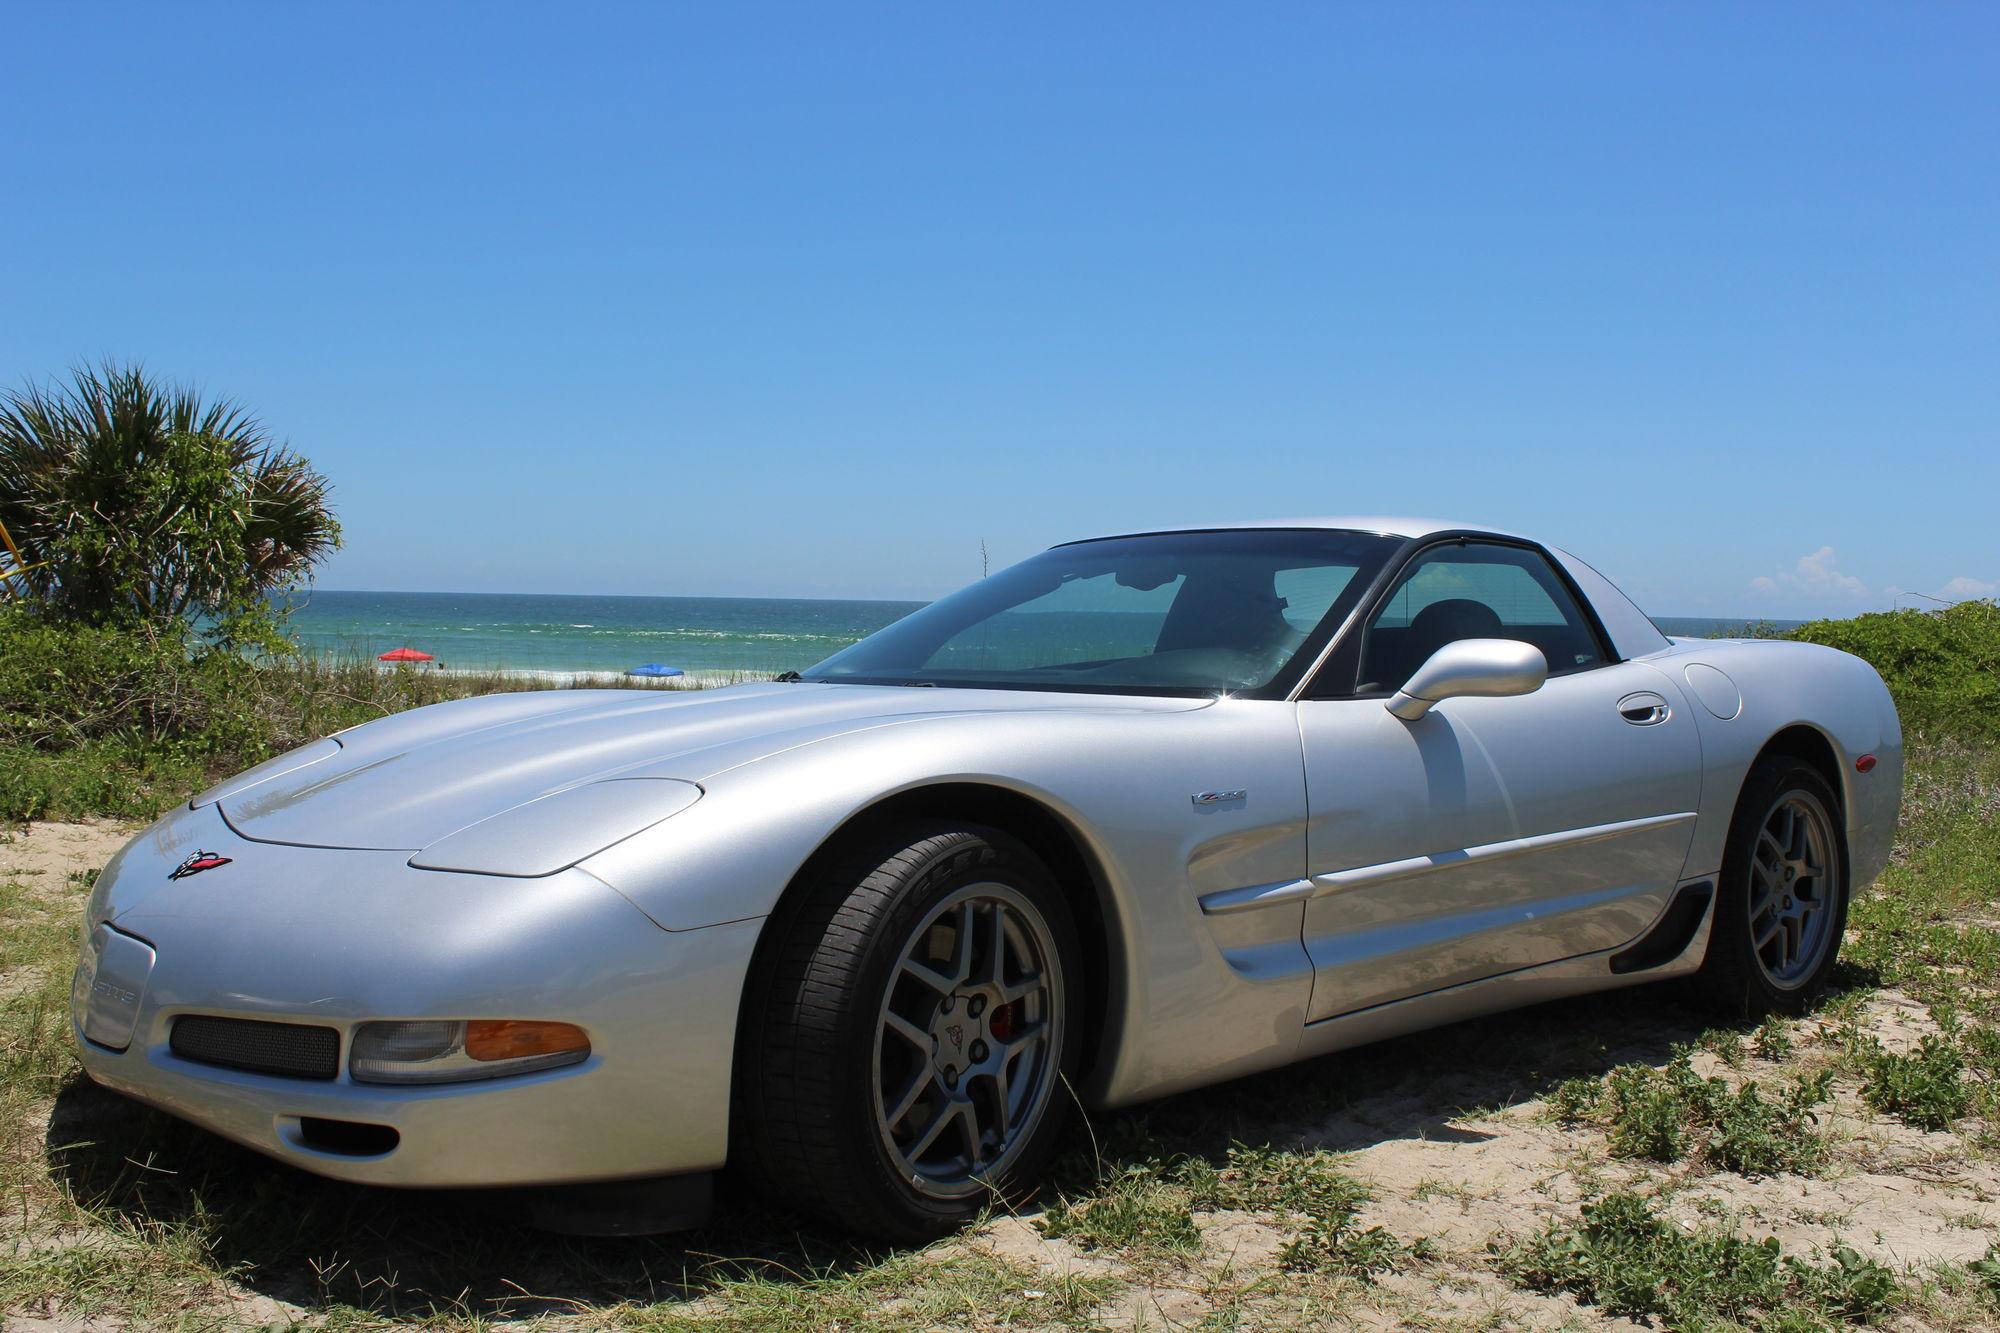 craigslist panama city cars cars image 2018